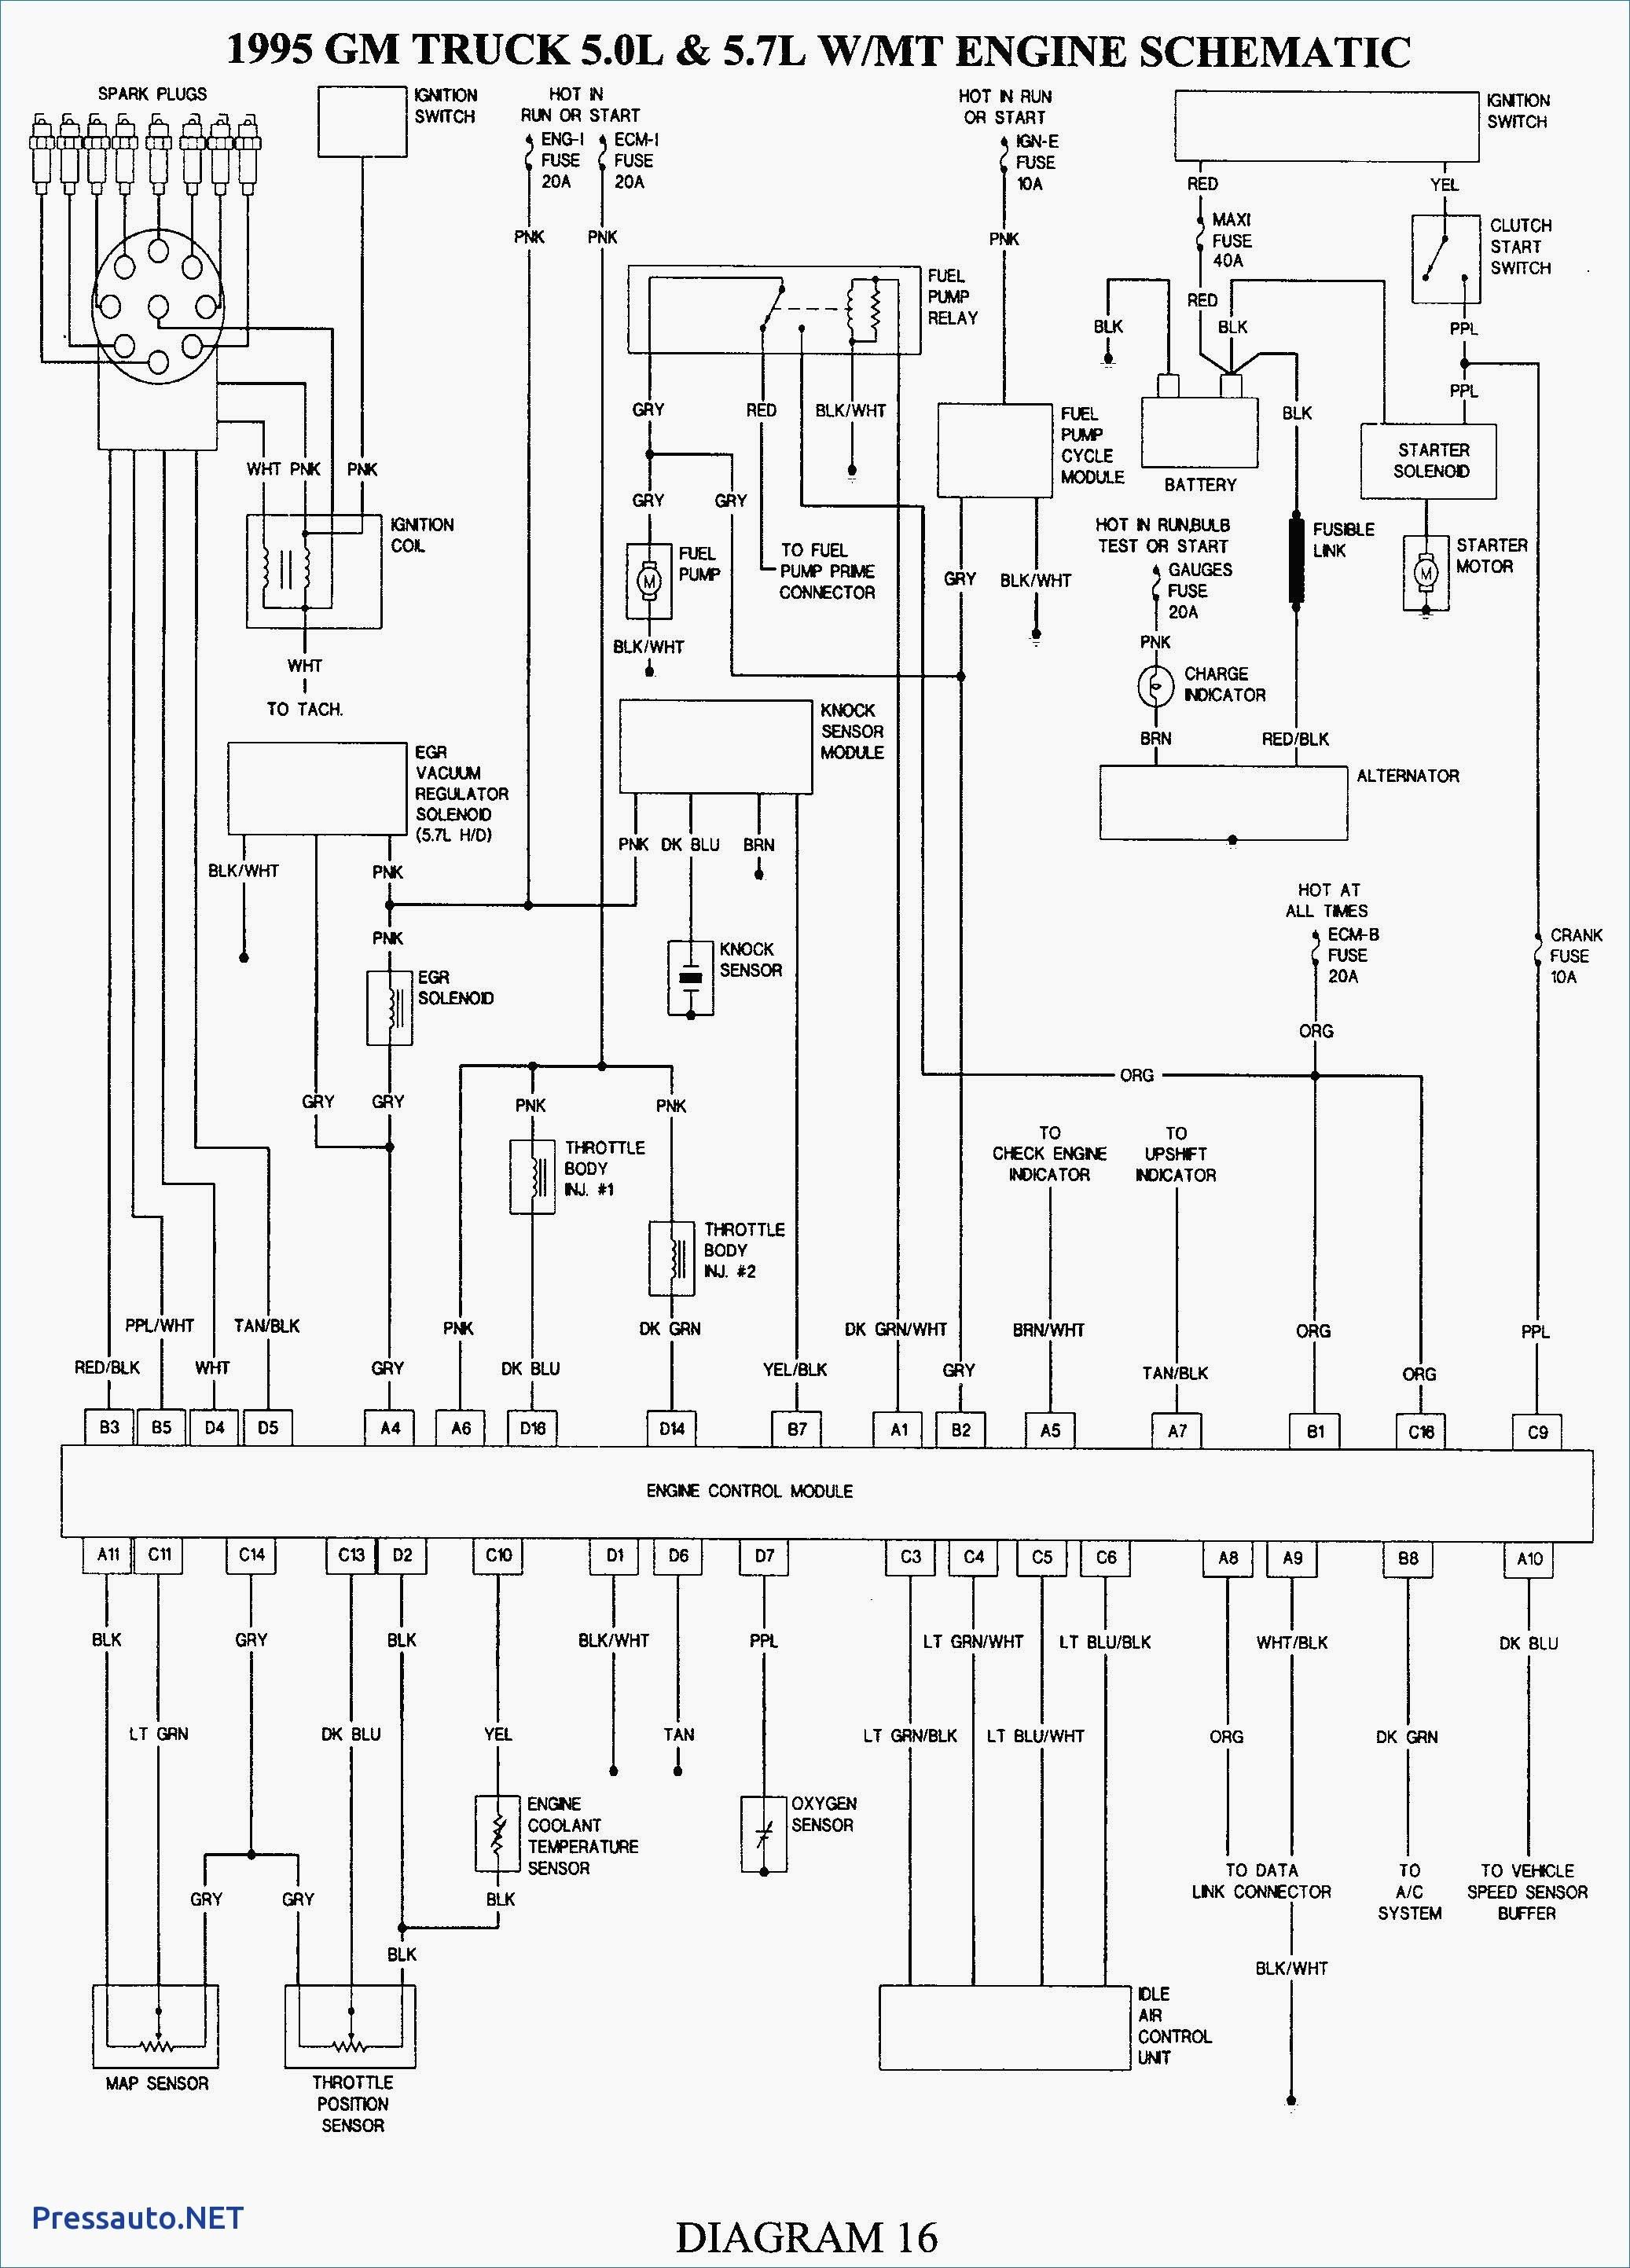 Mack Gu713 Wiring Diagram 1993 Ch613 Trusted Schematics Gmc Typhoon Diagrams